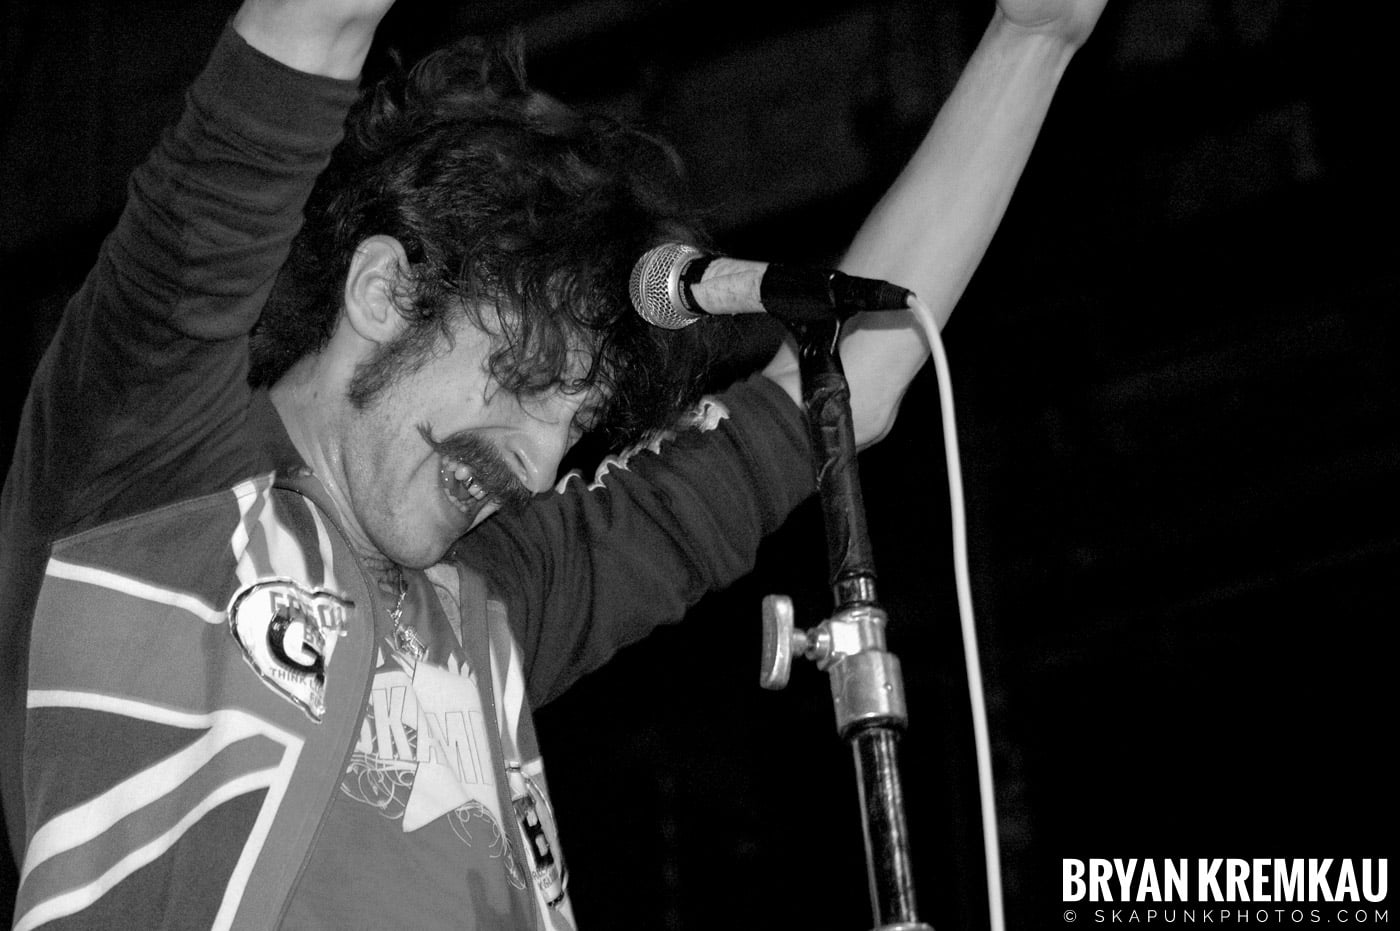 Gogol Bordello @ The Troc, Philadelphia PA - 4.15.06 (22)